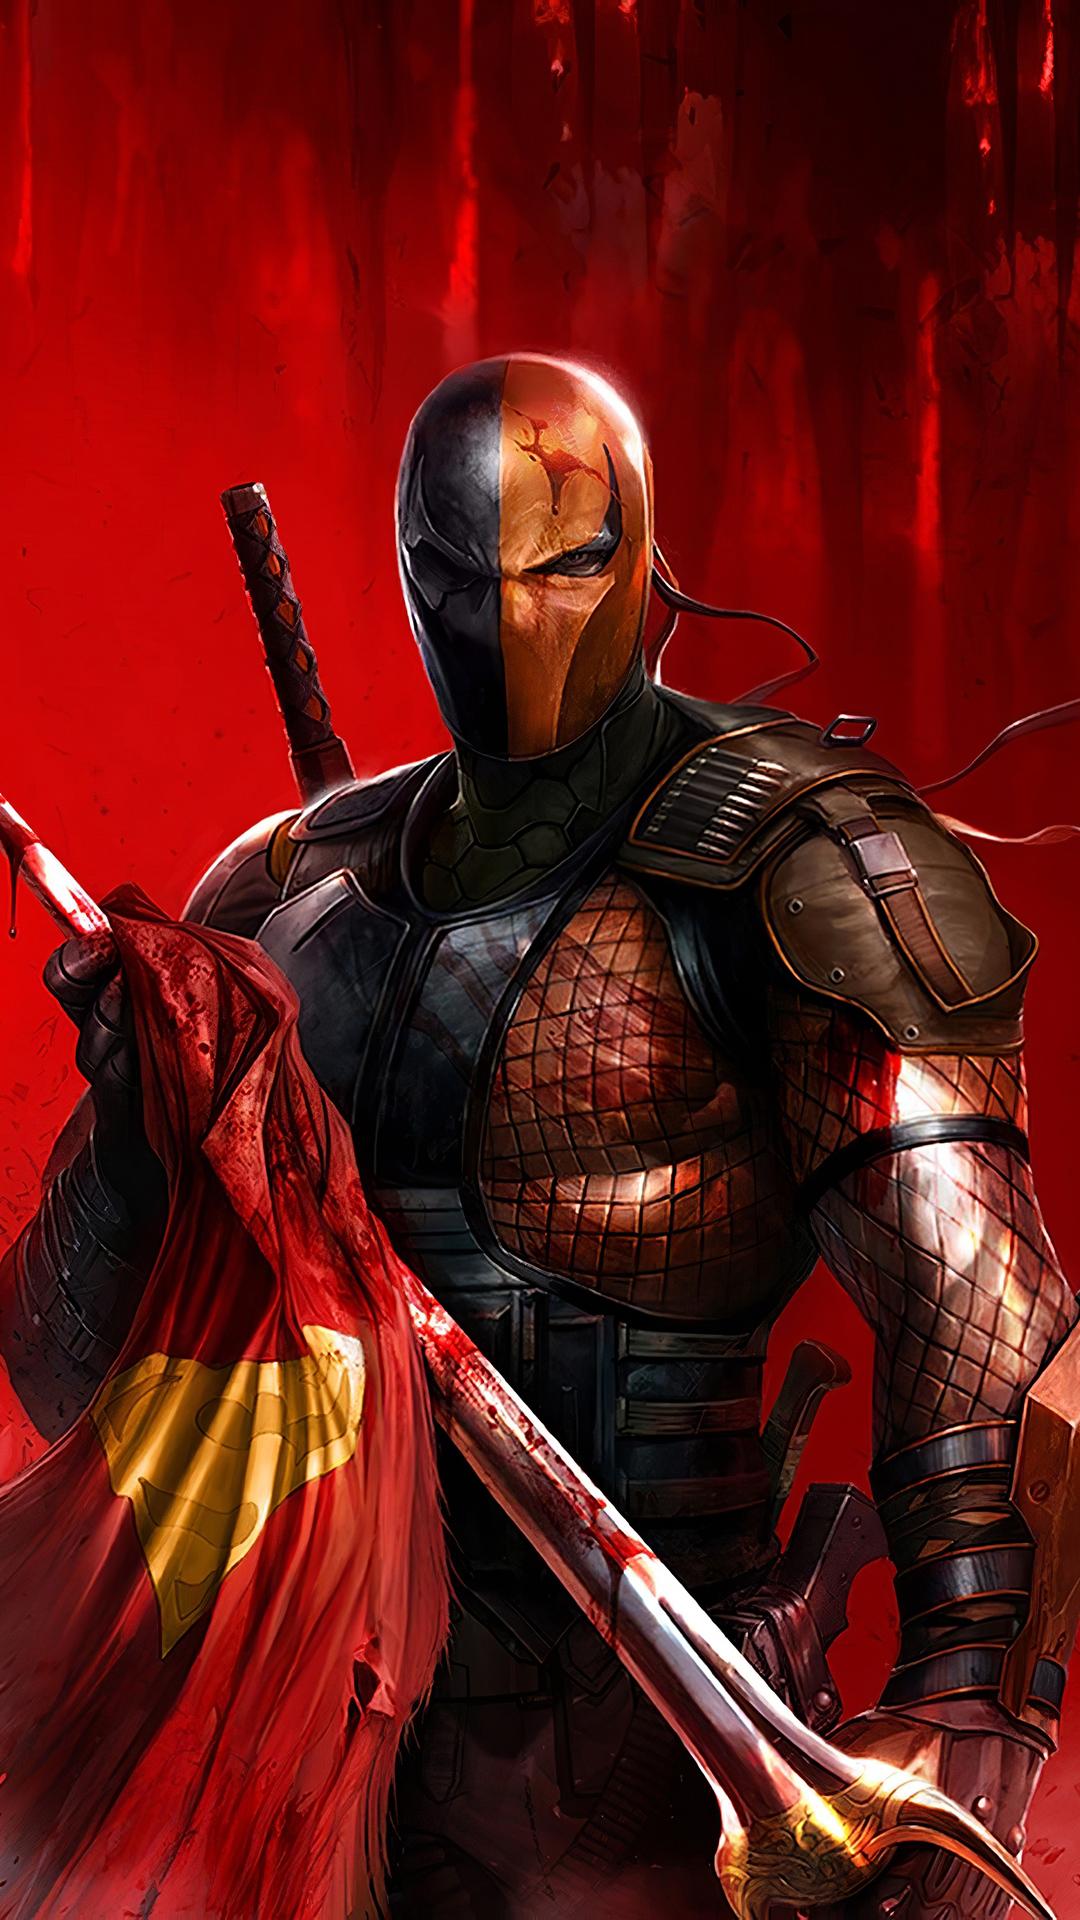 Wallpaper Deathstroke Superheroes Artwork Hd 4k